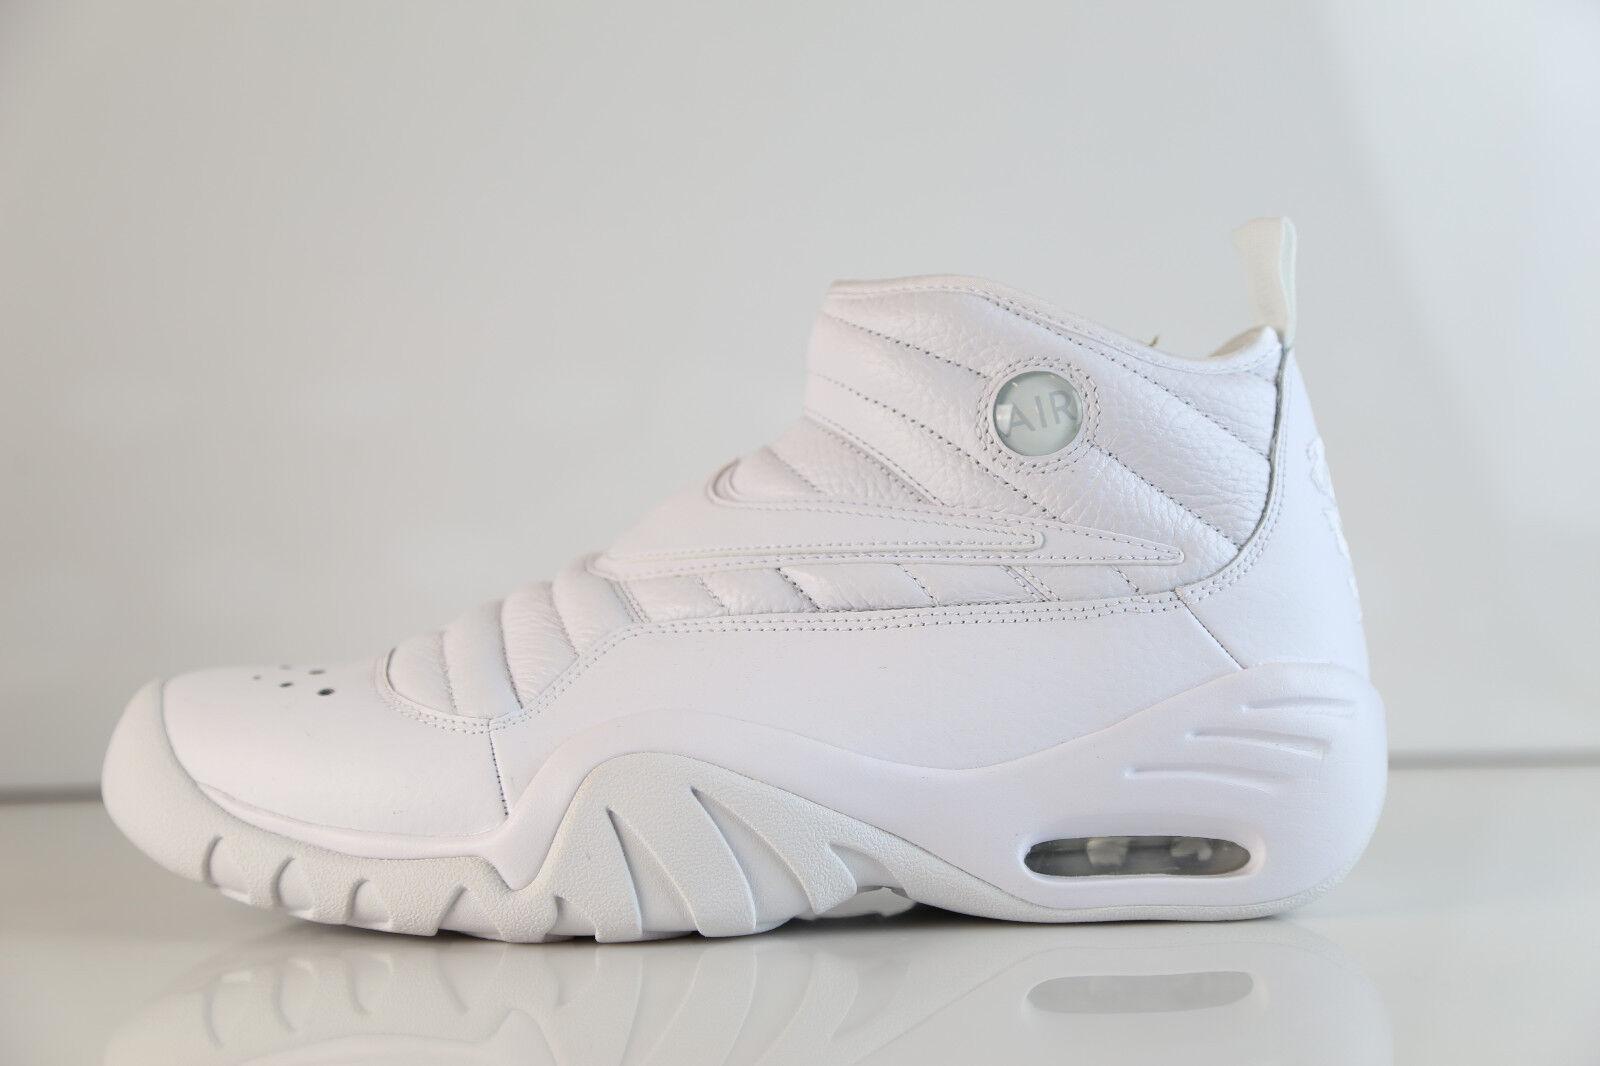 Nike Air Shake NDestrukt White White 880869-101 8-14 triple 1 max 3